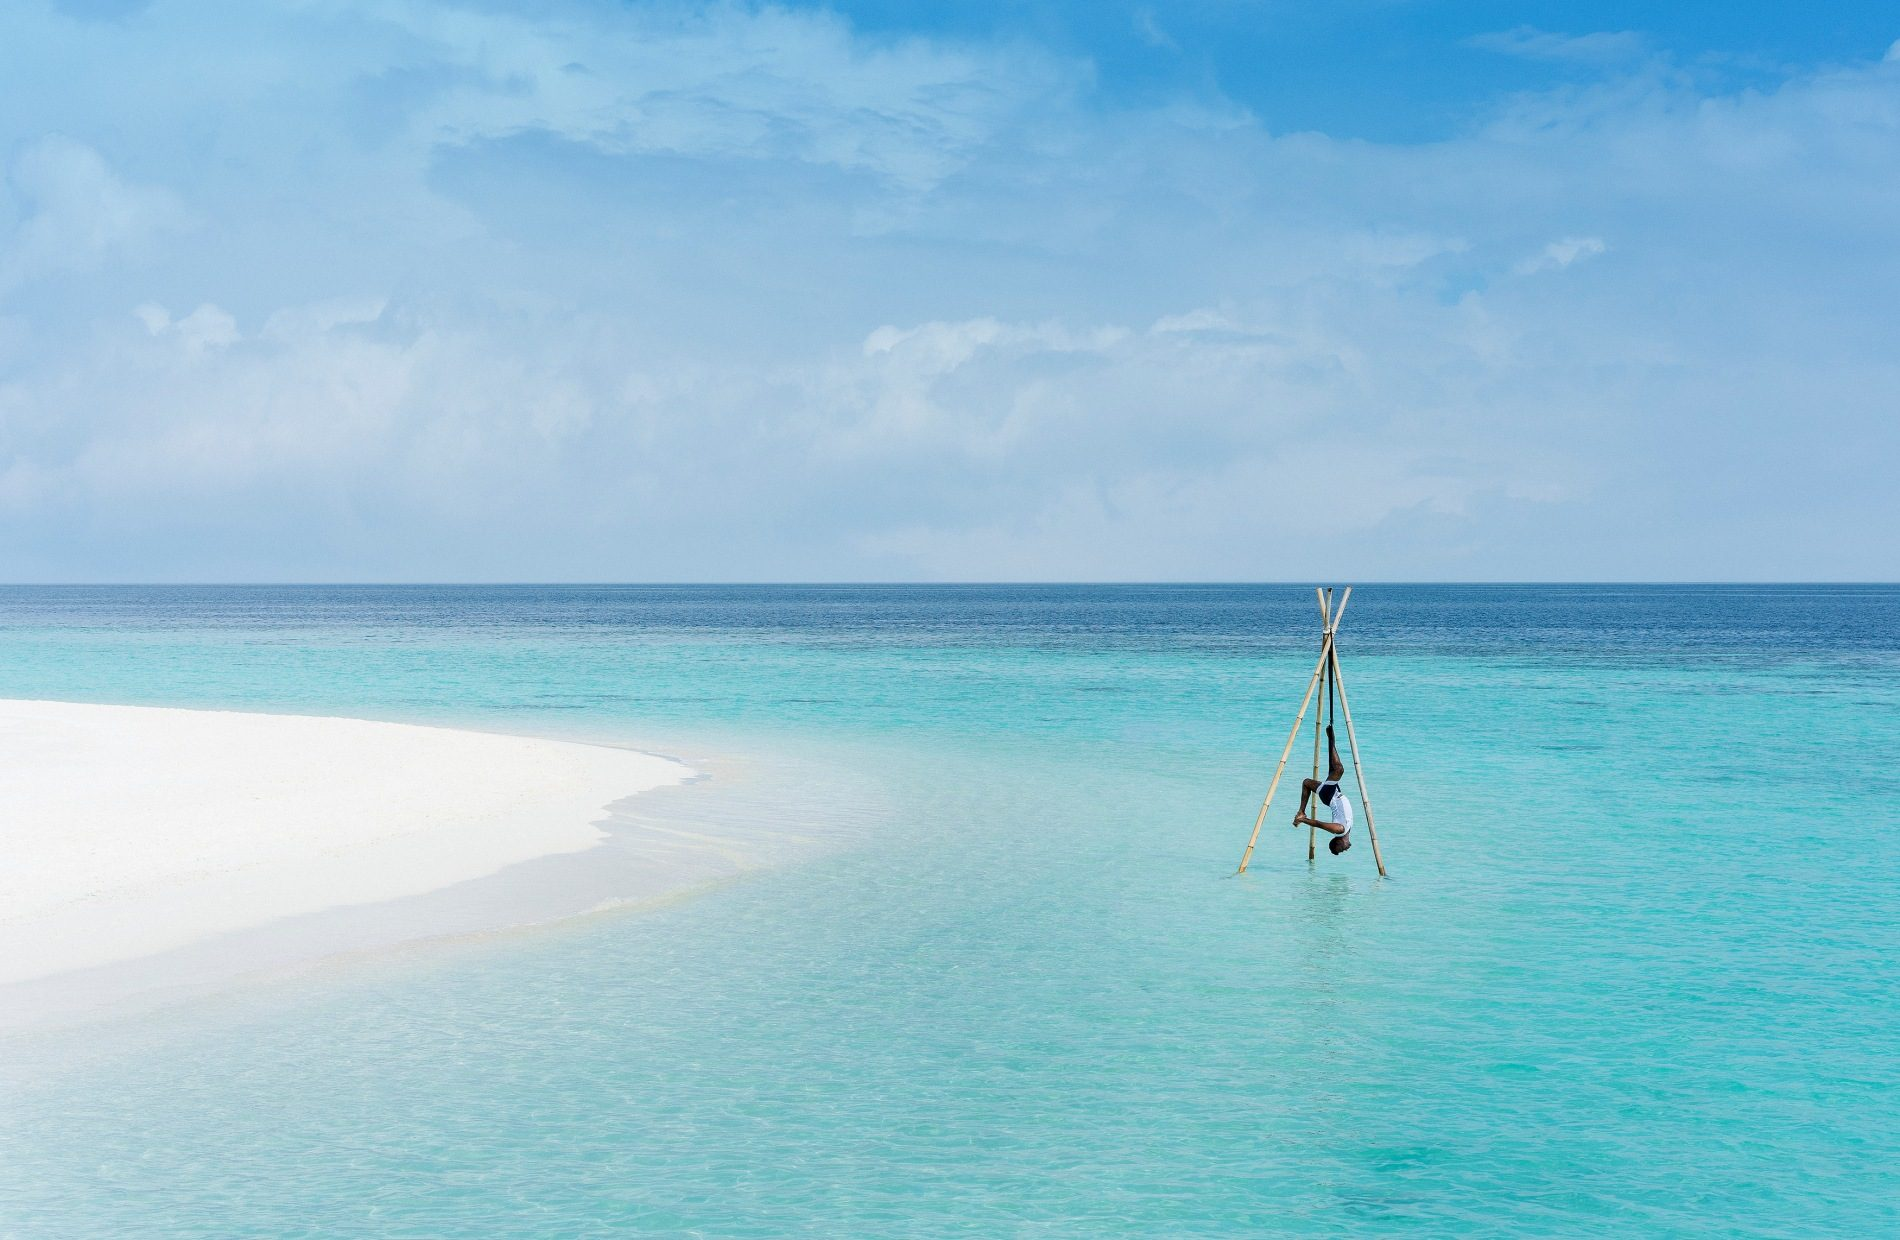 Anantara Kihavah Maldives Villas - Overwater Yoga